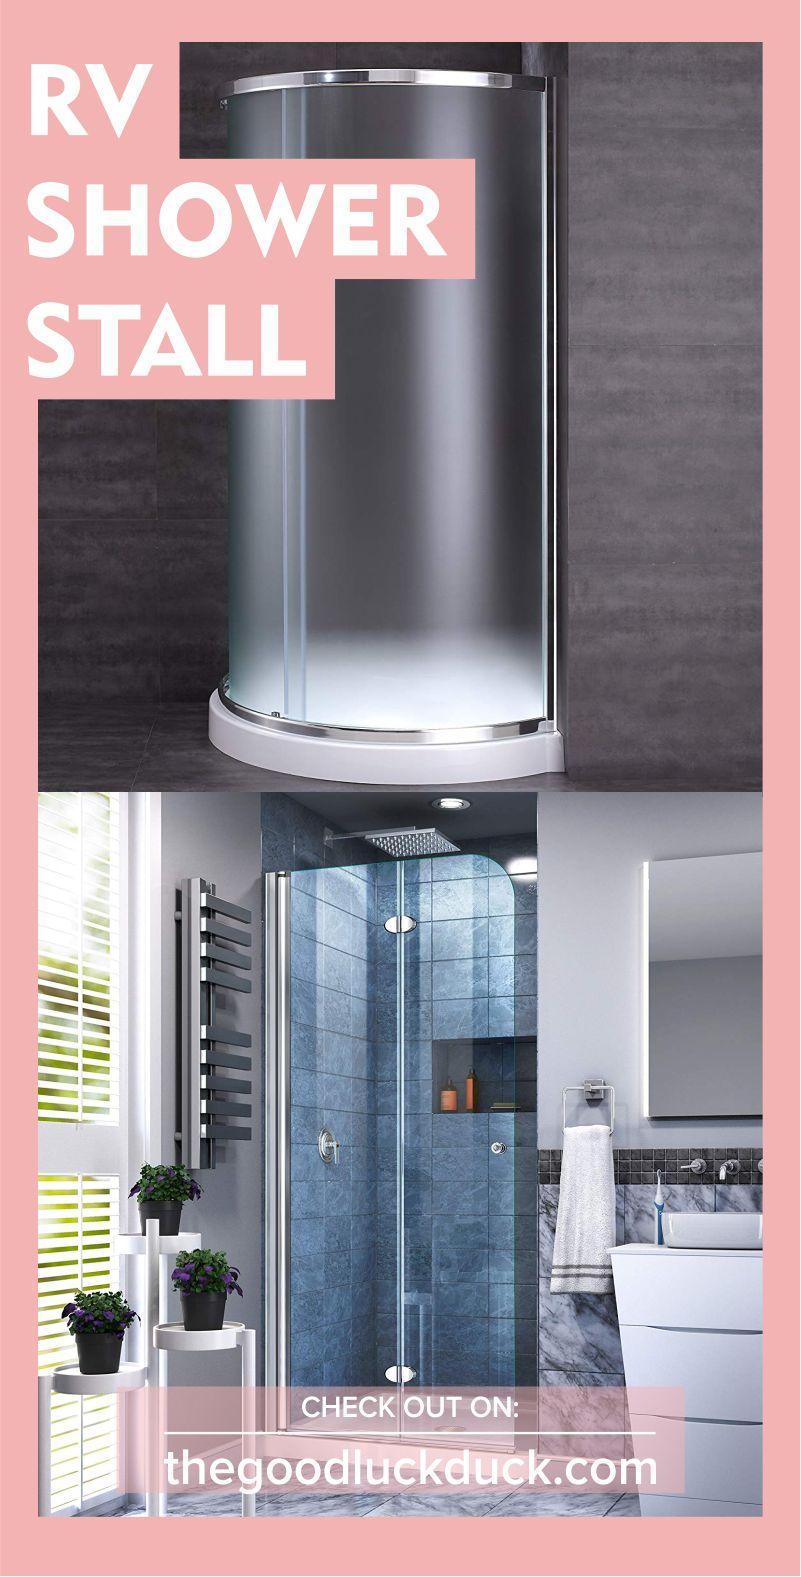 30 Best Rv Shower 2020 Shower Head Pan Curtain Stall